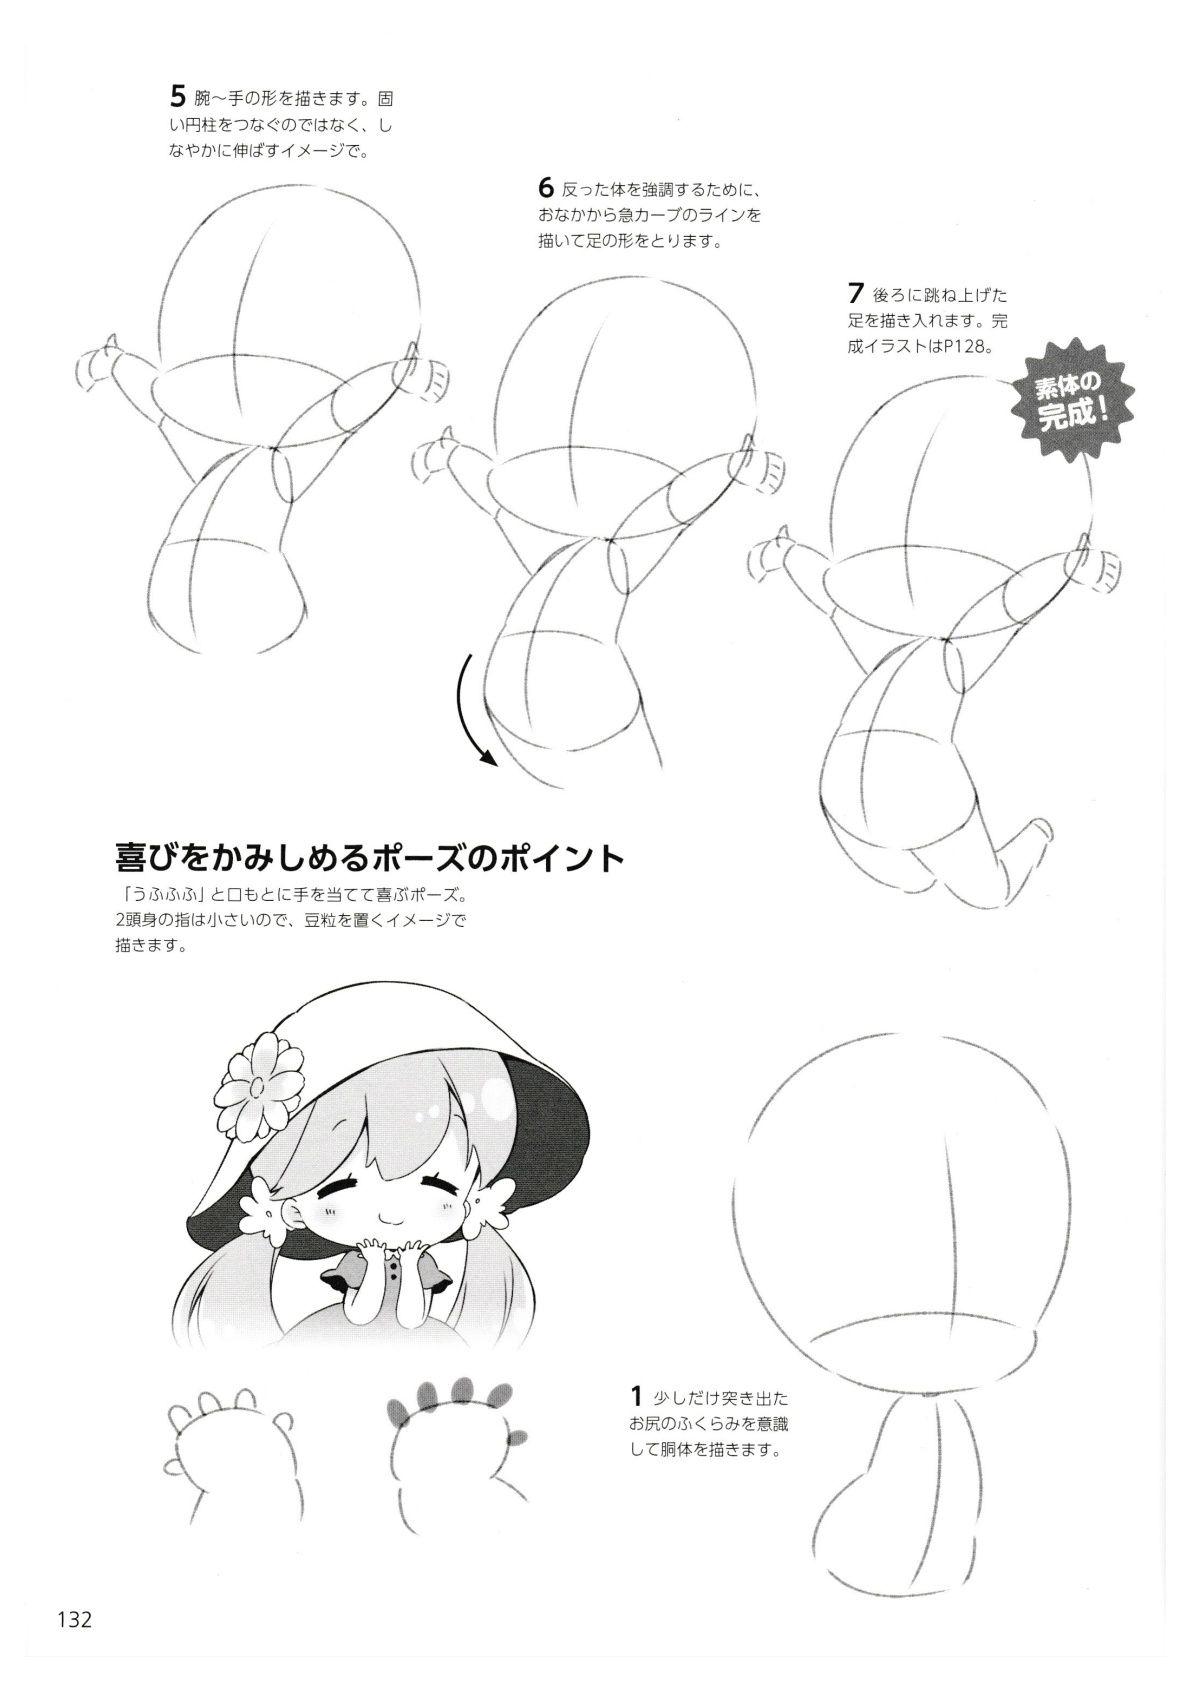 Pin Oleh Caecilia Dewi Di Drawing Class Di 2020 Dengan Gambar Sketsa Cara Menggambar Gambar Anime